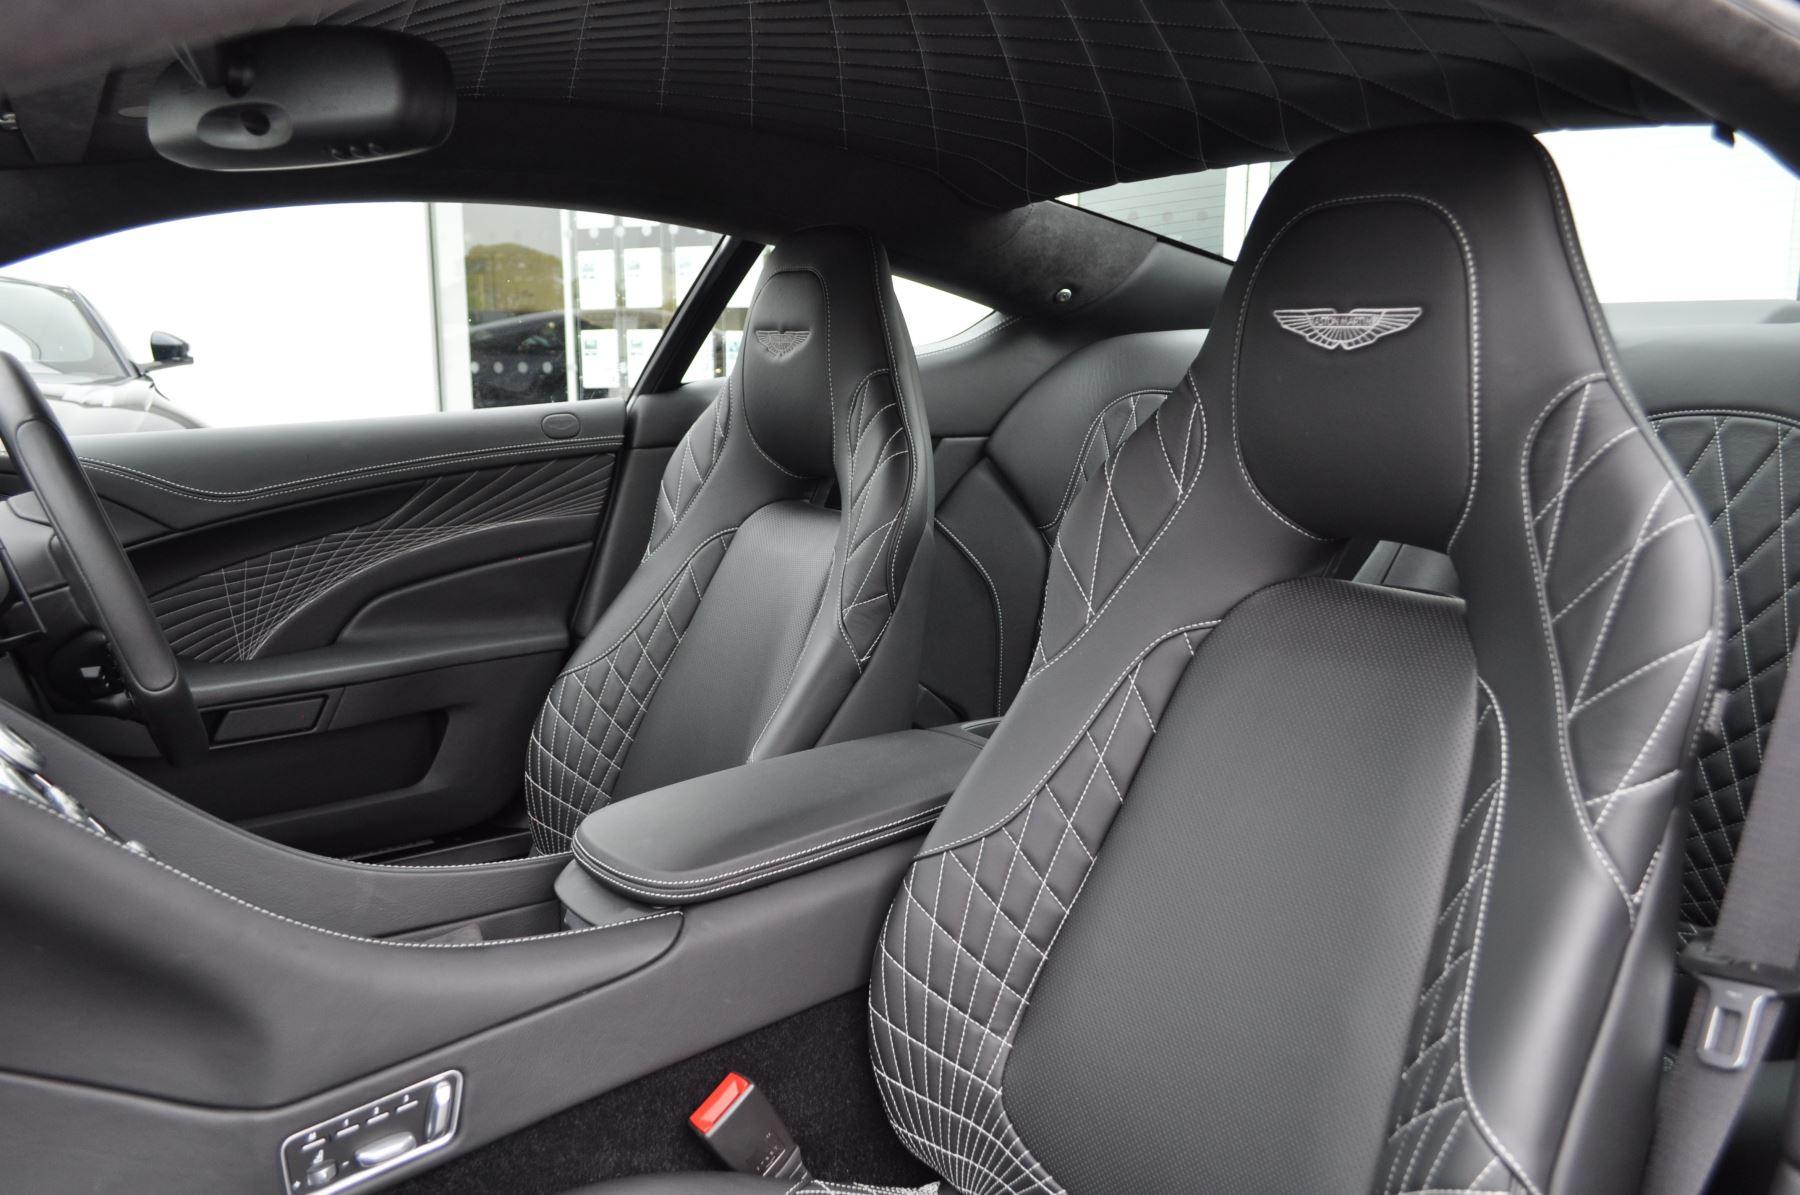 Aston Martin Vanquish S V12 [595] S 2+2 2dr Touchtronic image 32